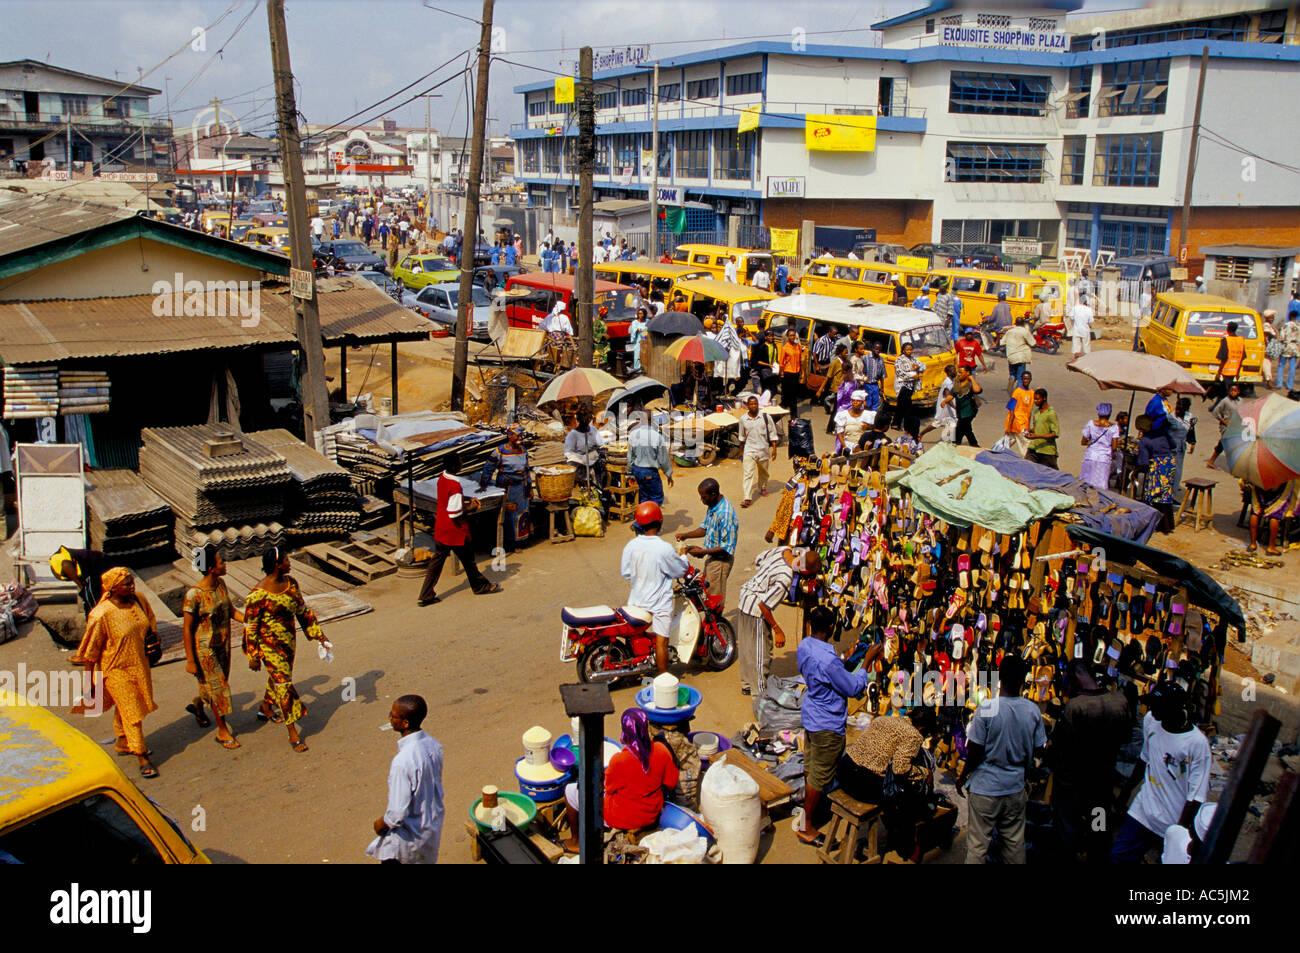 Lagos Market, Nigeria, market stalls - Stock Image